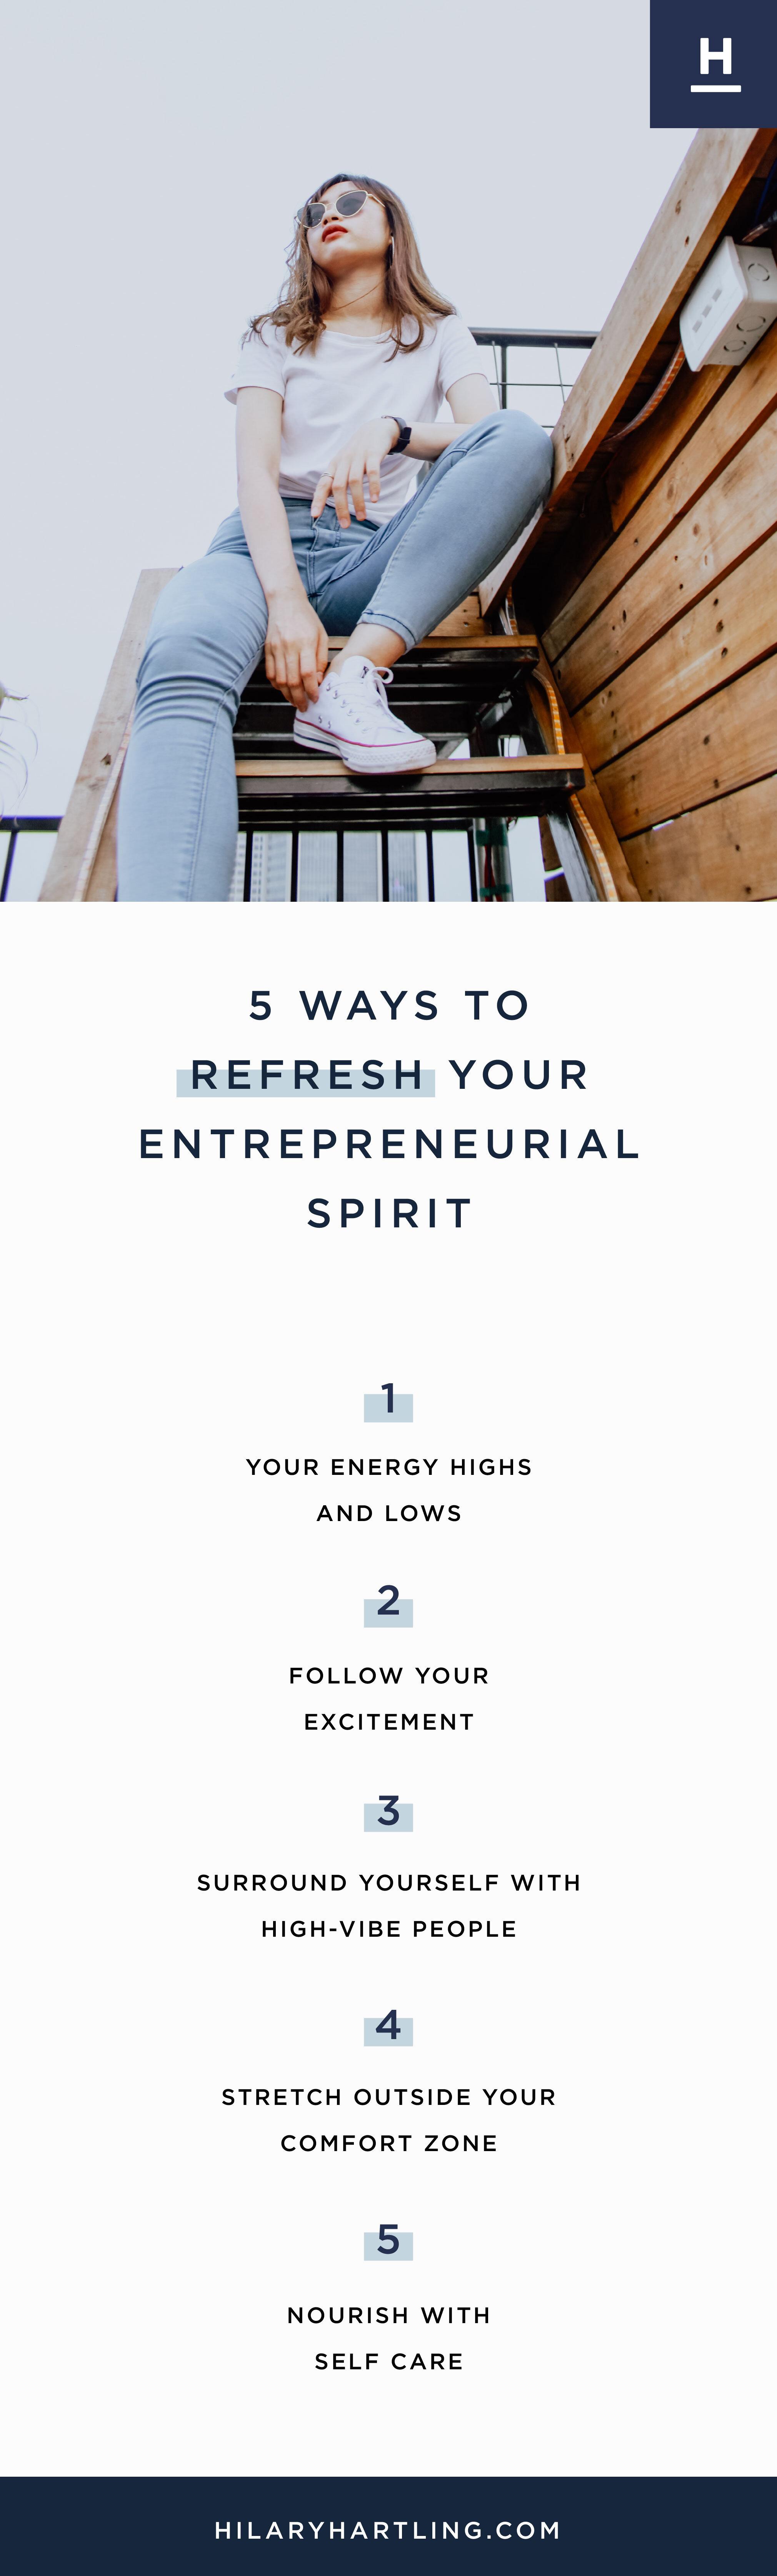 5-Ways-To--Refresh-Your-Entrepreneurial-Spirit.jpg